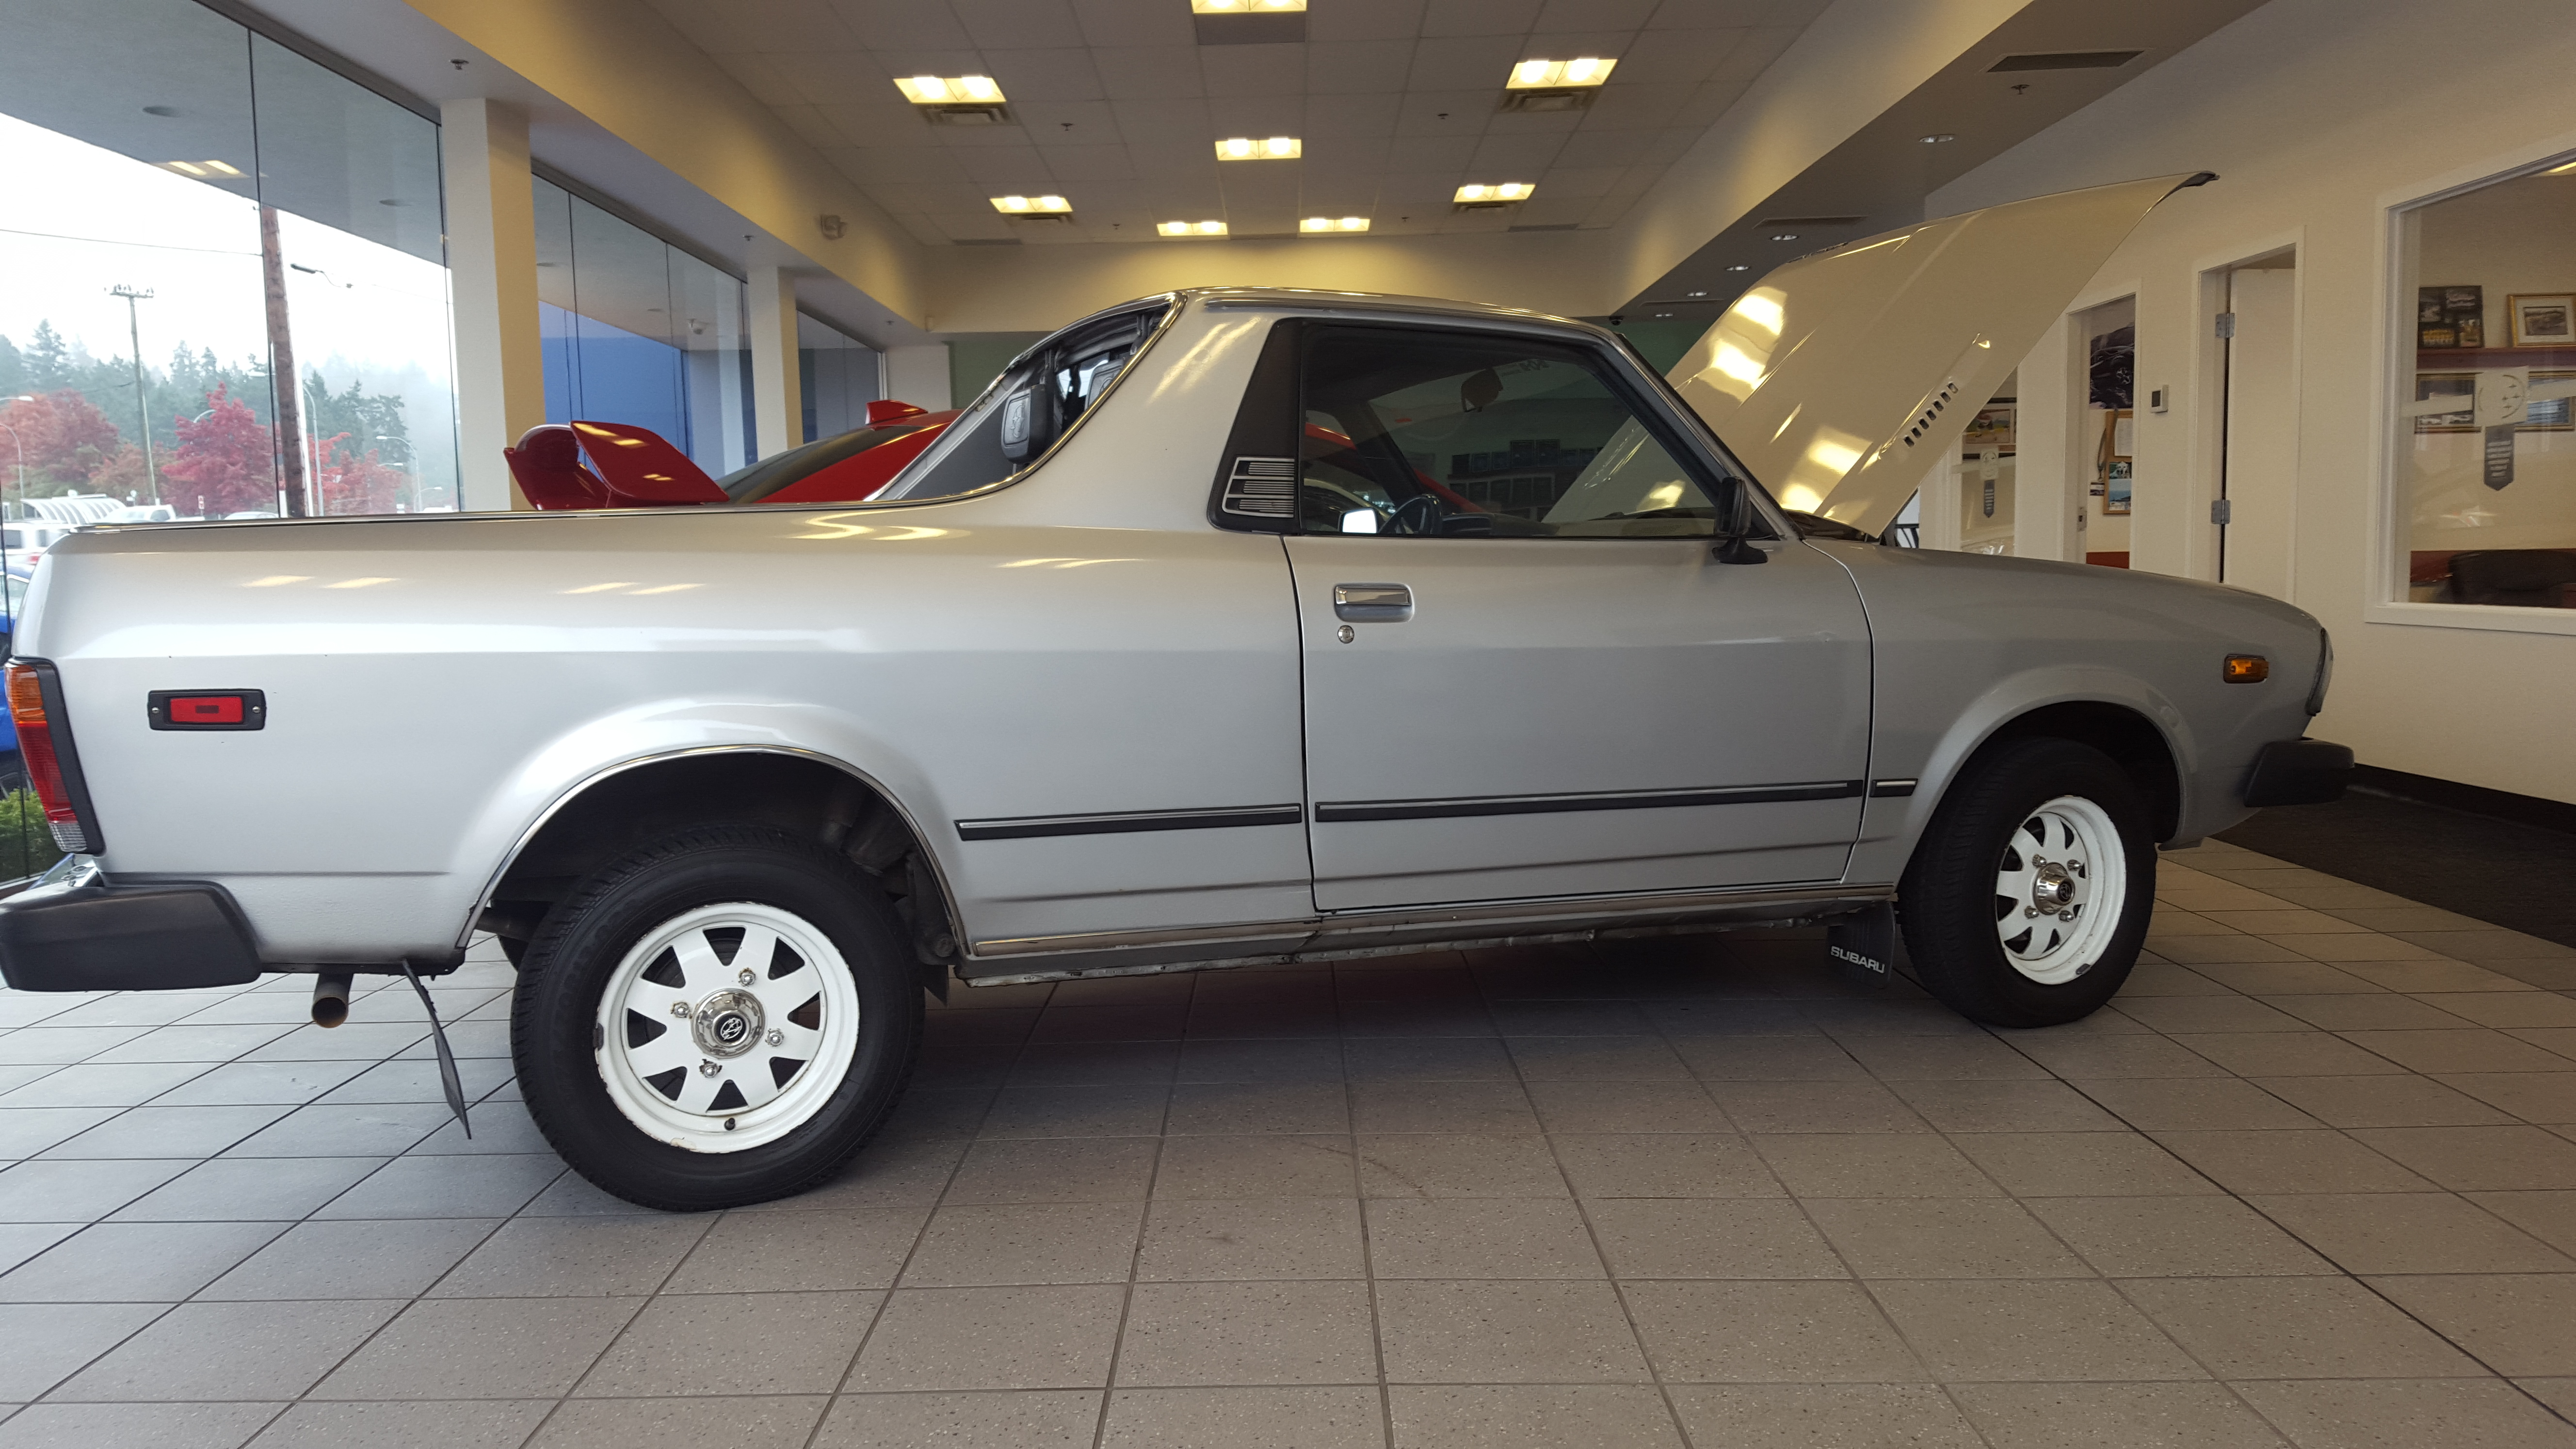 Mint Subaru Brat at the local dealership The car is grandfathered